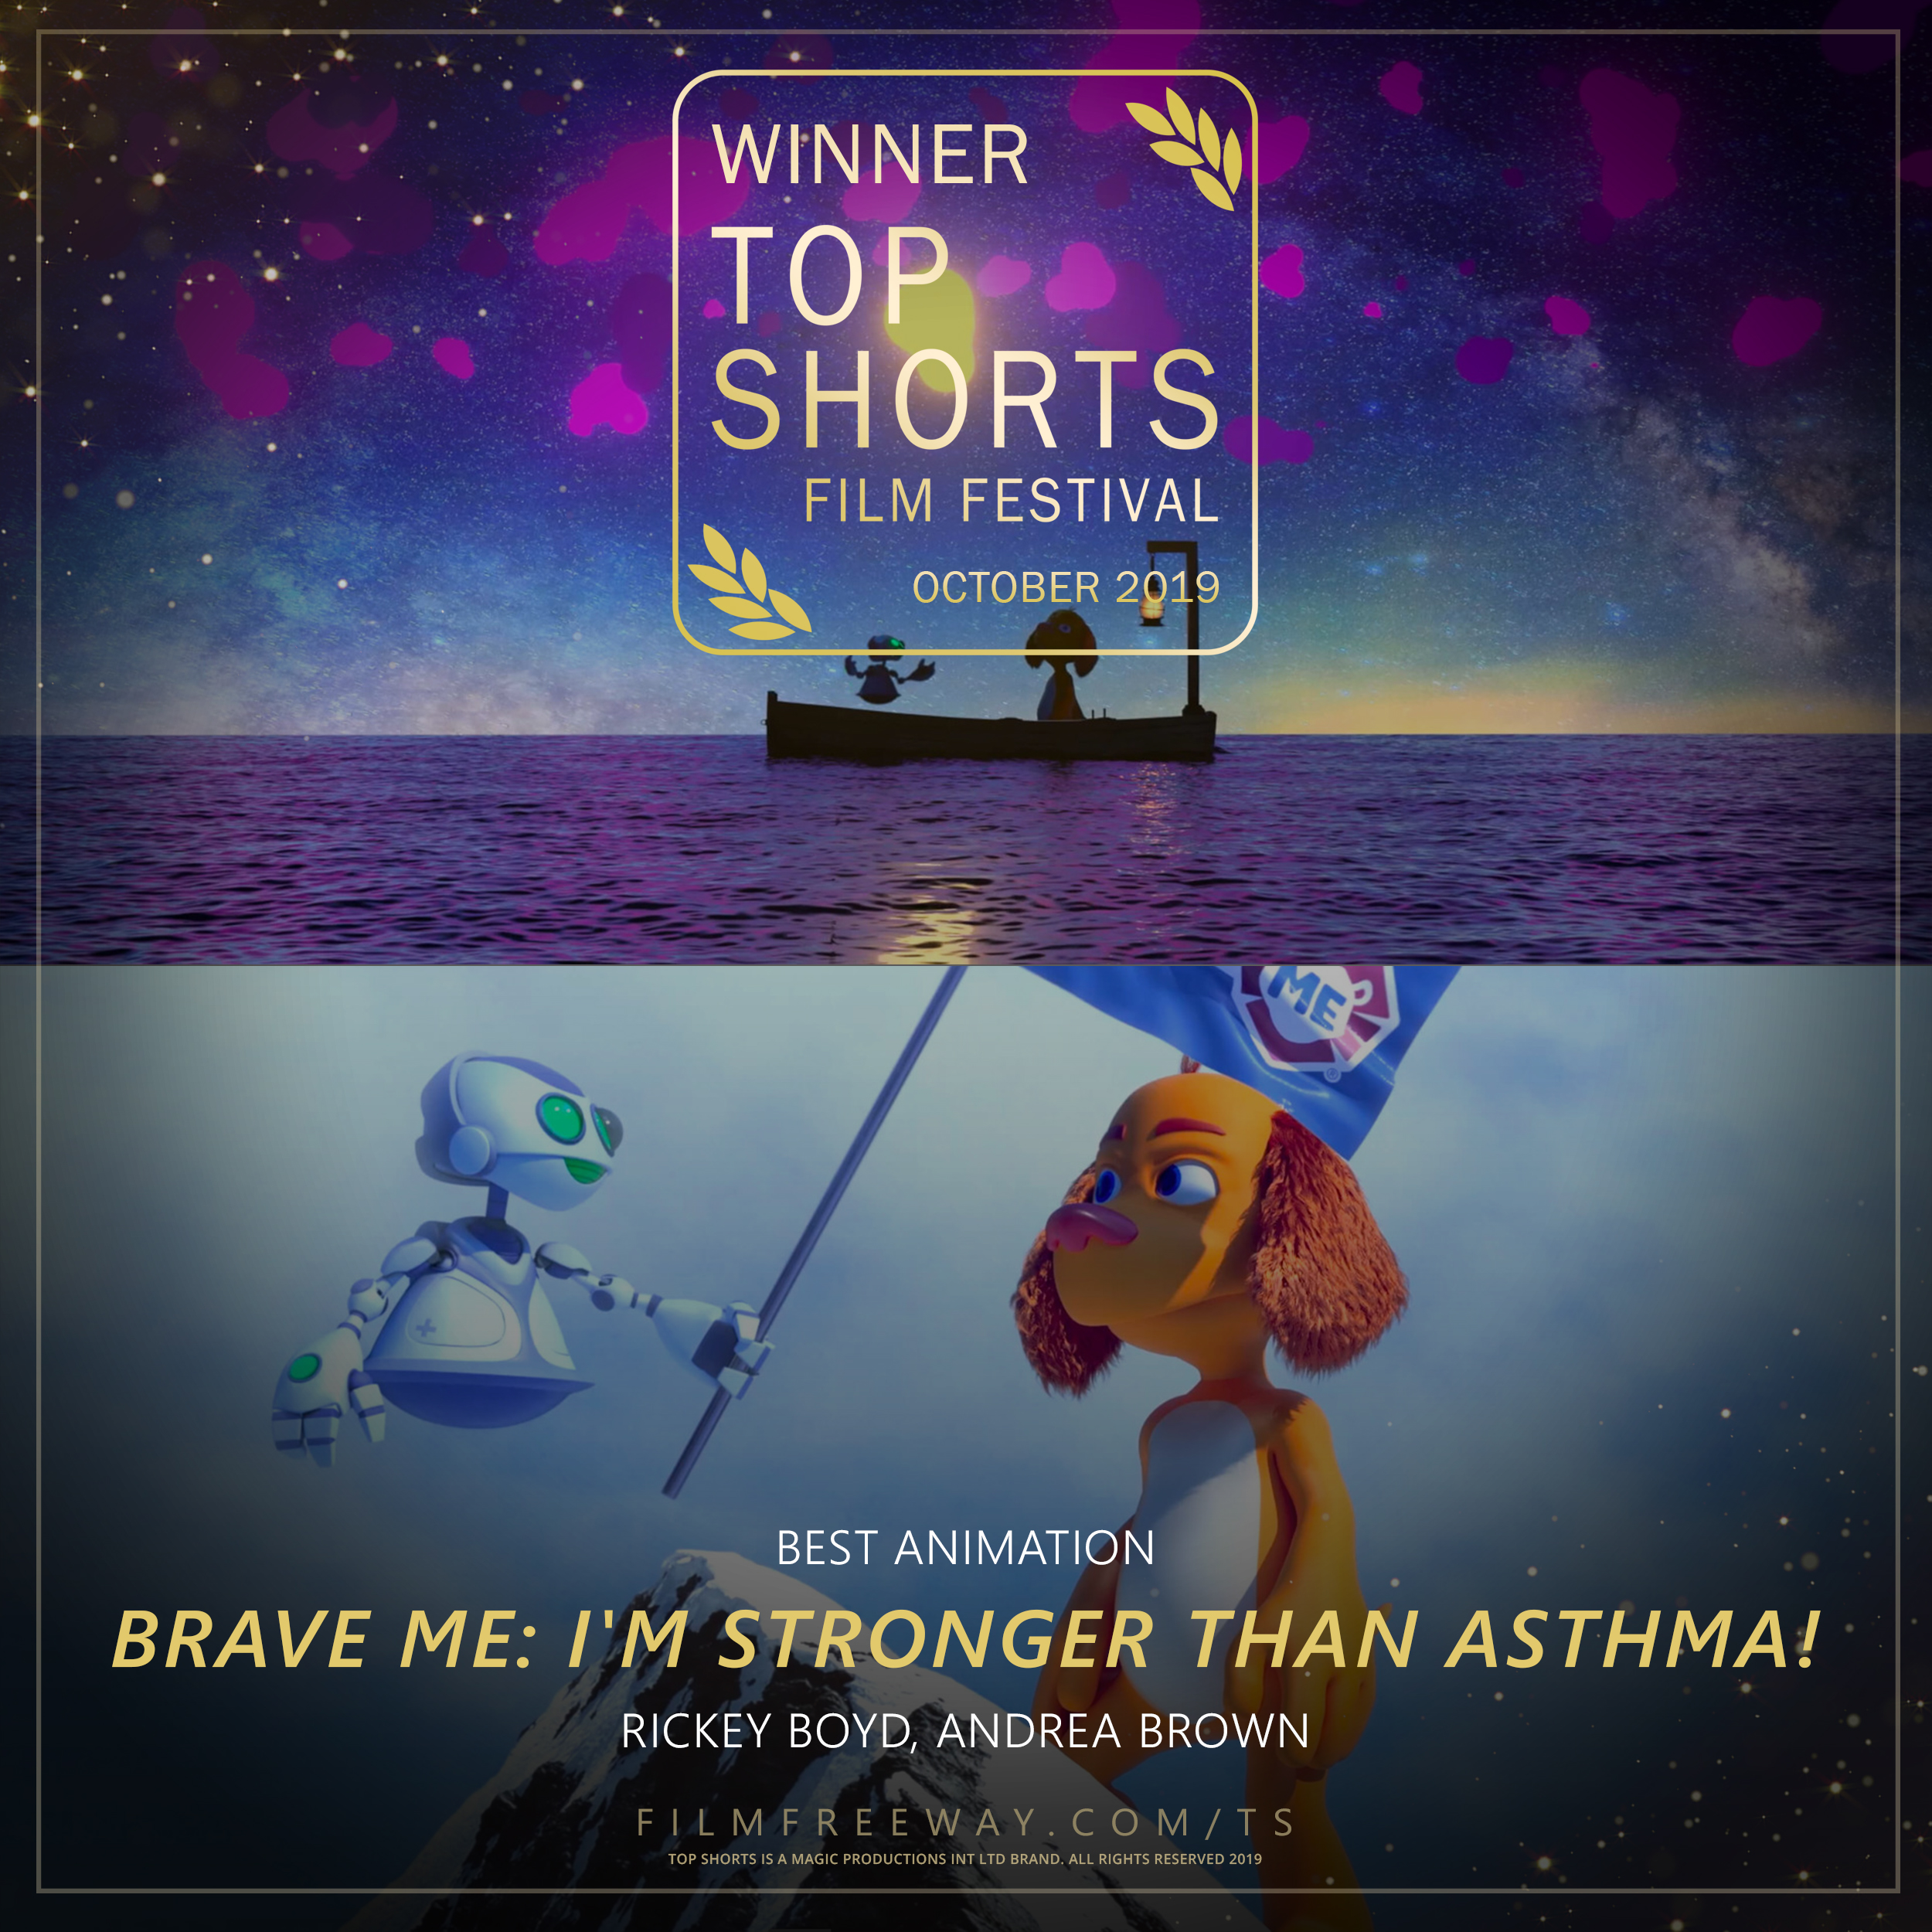 Brave Me I'm Stronger than Asthma design